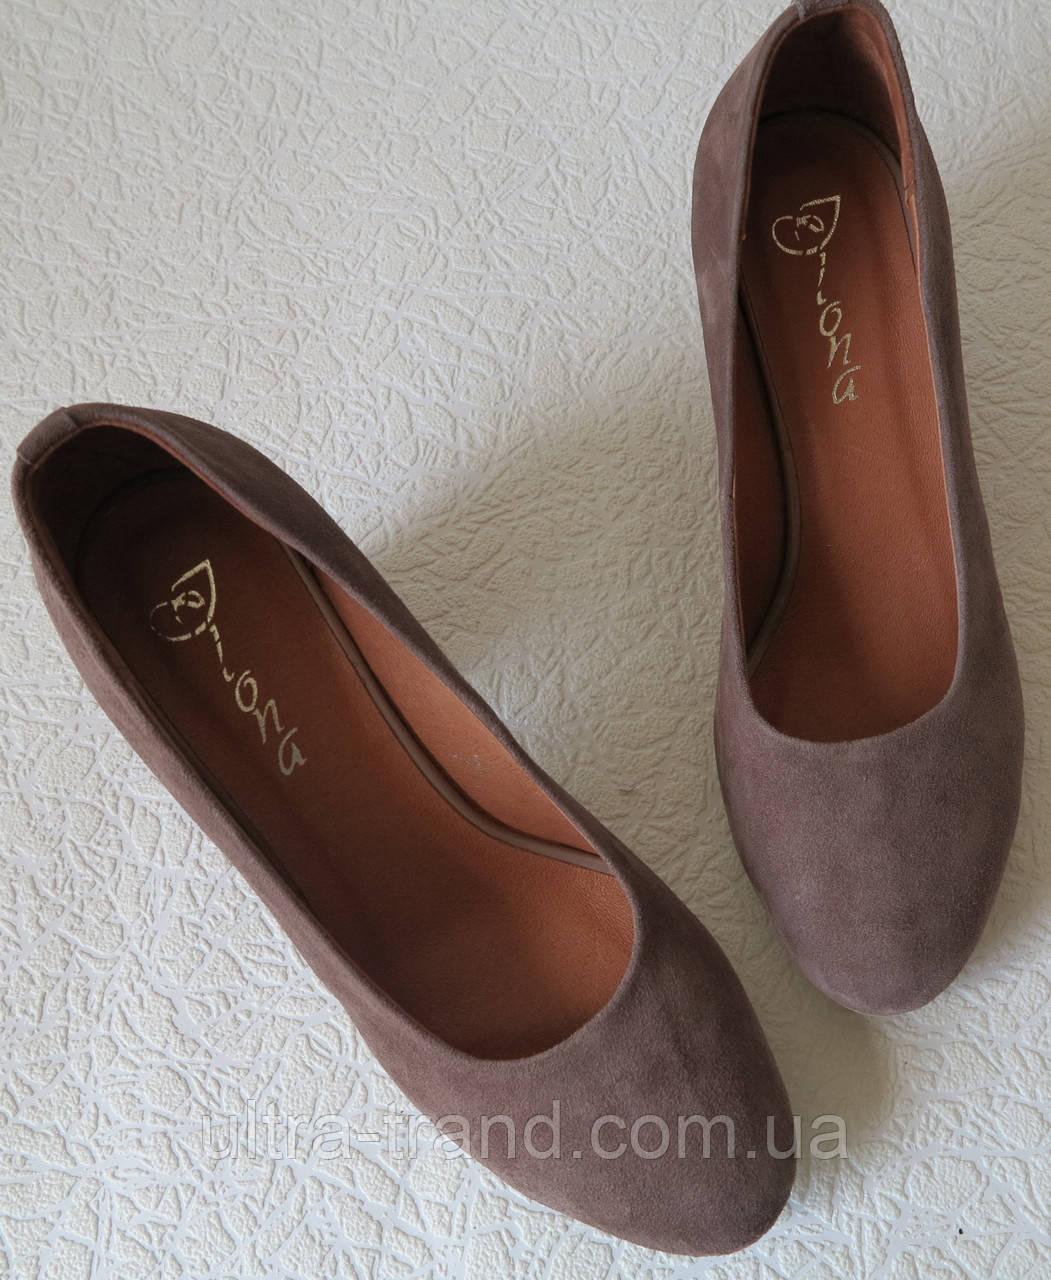 Nona! Женские классические замшевые туфли цвета какао на каблуке 7,5 см